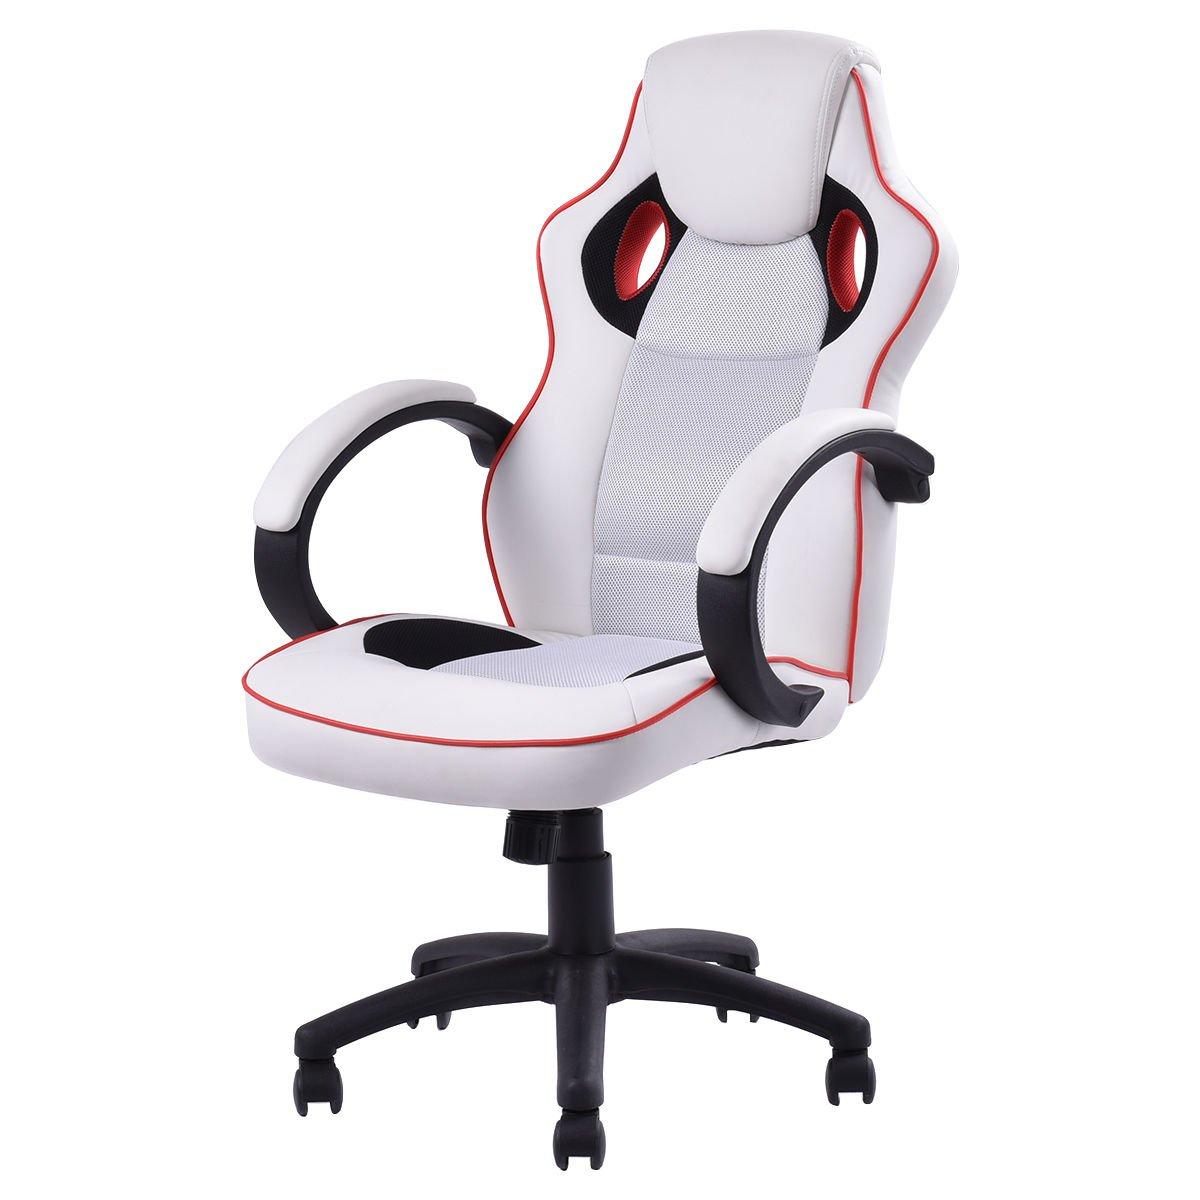 Banana game chair - Giantex Executive Swivel Gaming Chair High Back Sport Racing Style Ergonomic Adjustable Chair White